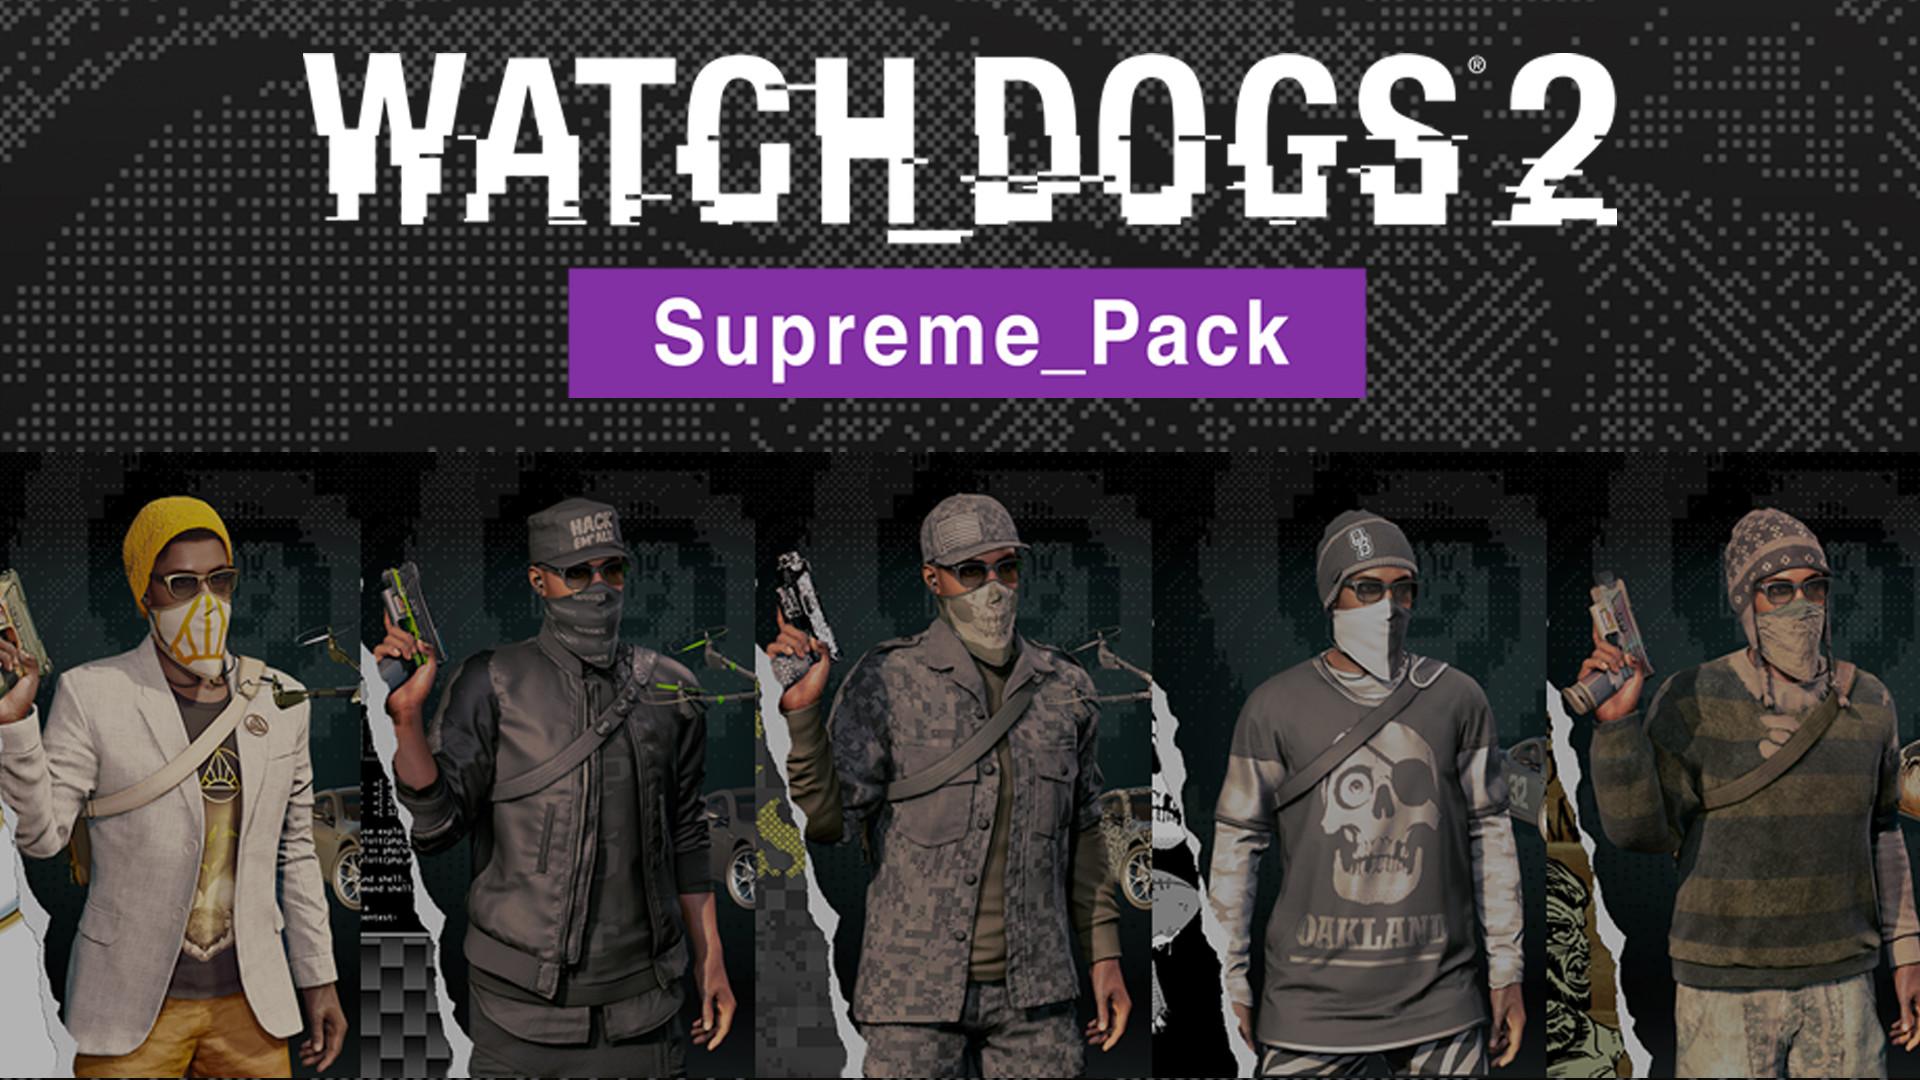 Watch Dogs 2 - Supreme Pack (Uplay key) @ RU 2019